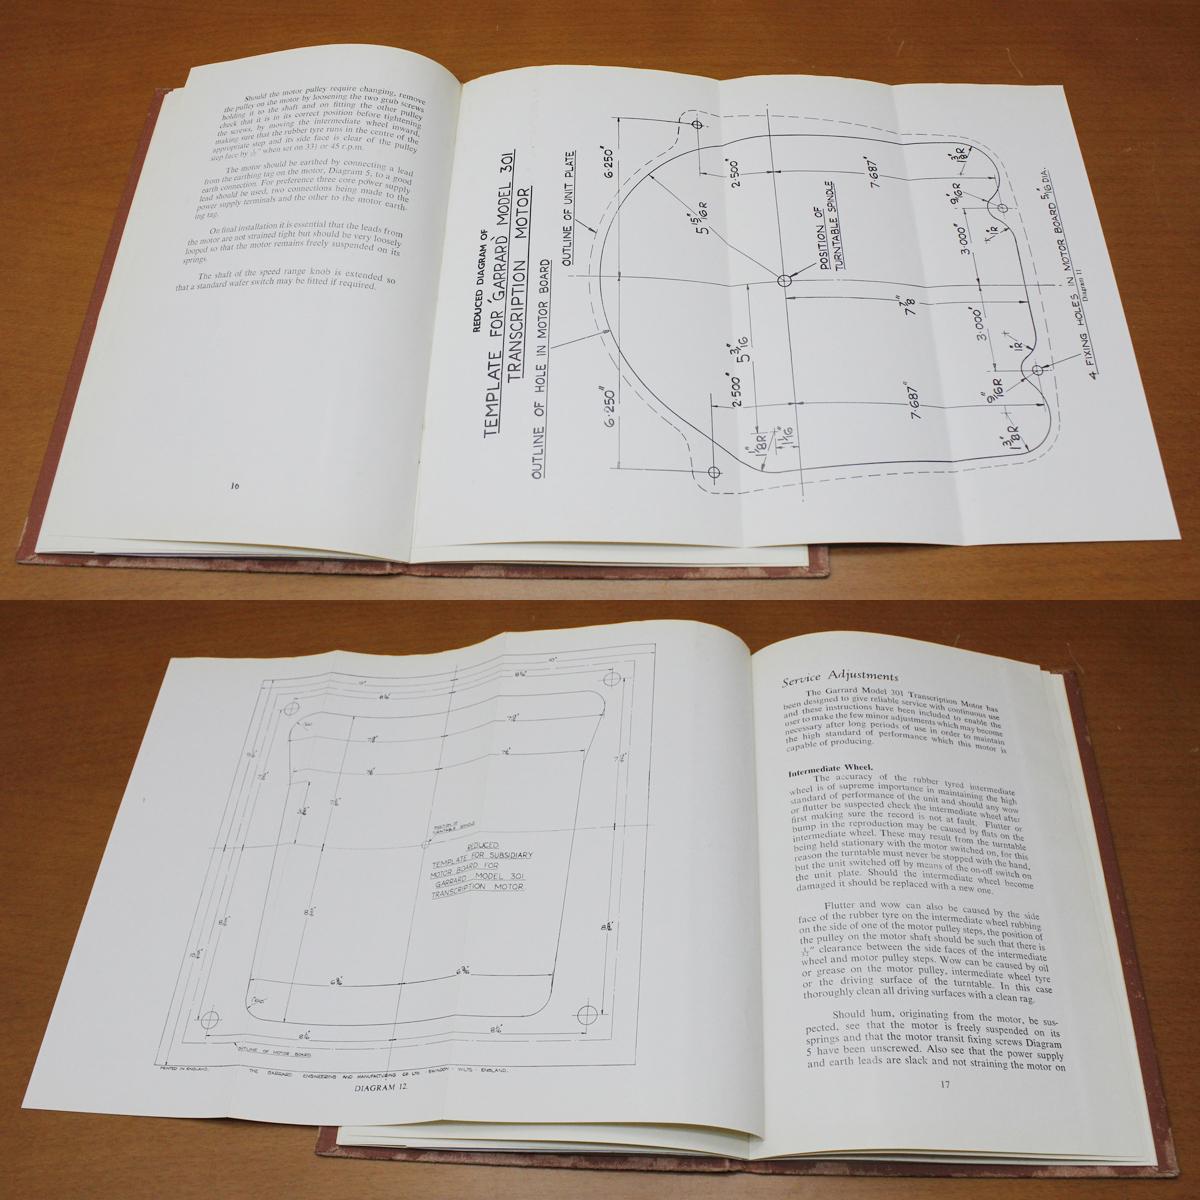 GARRARD301 manual[SN:768○○番台(星7)]ガラード英文取扱説明書 マニュアル おまけ日本語解説コピー付き_画像8